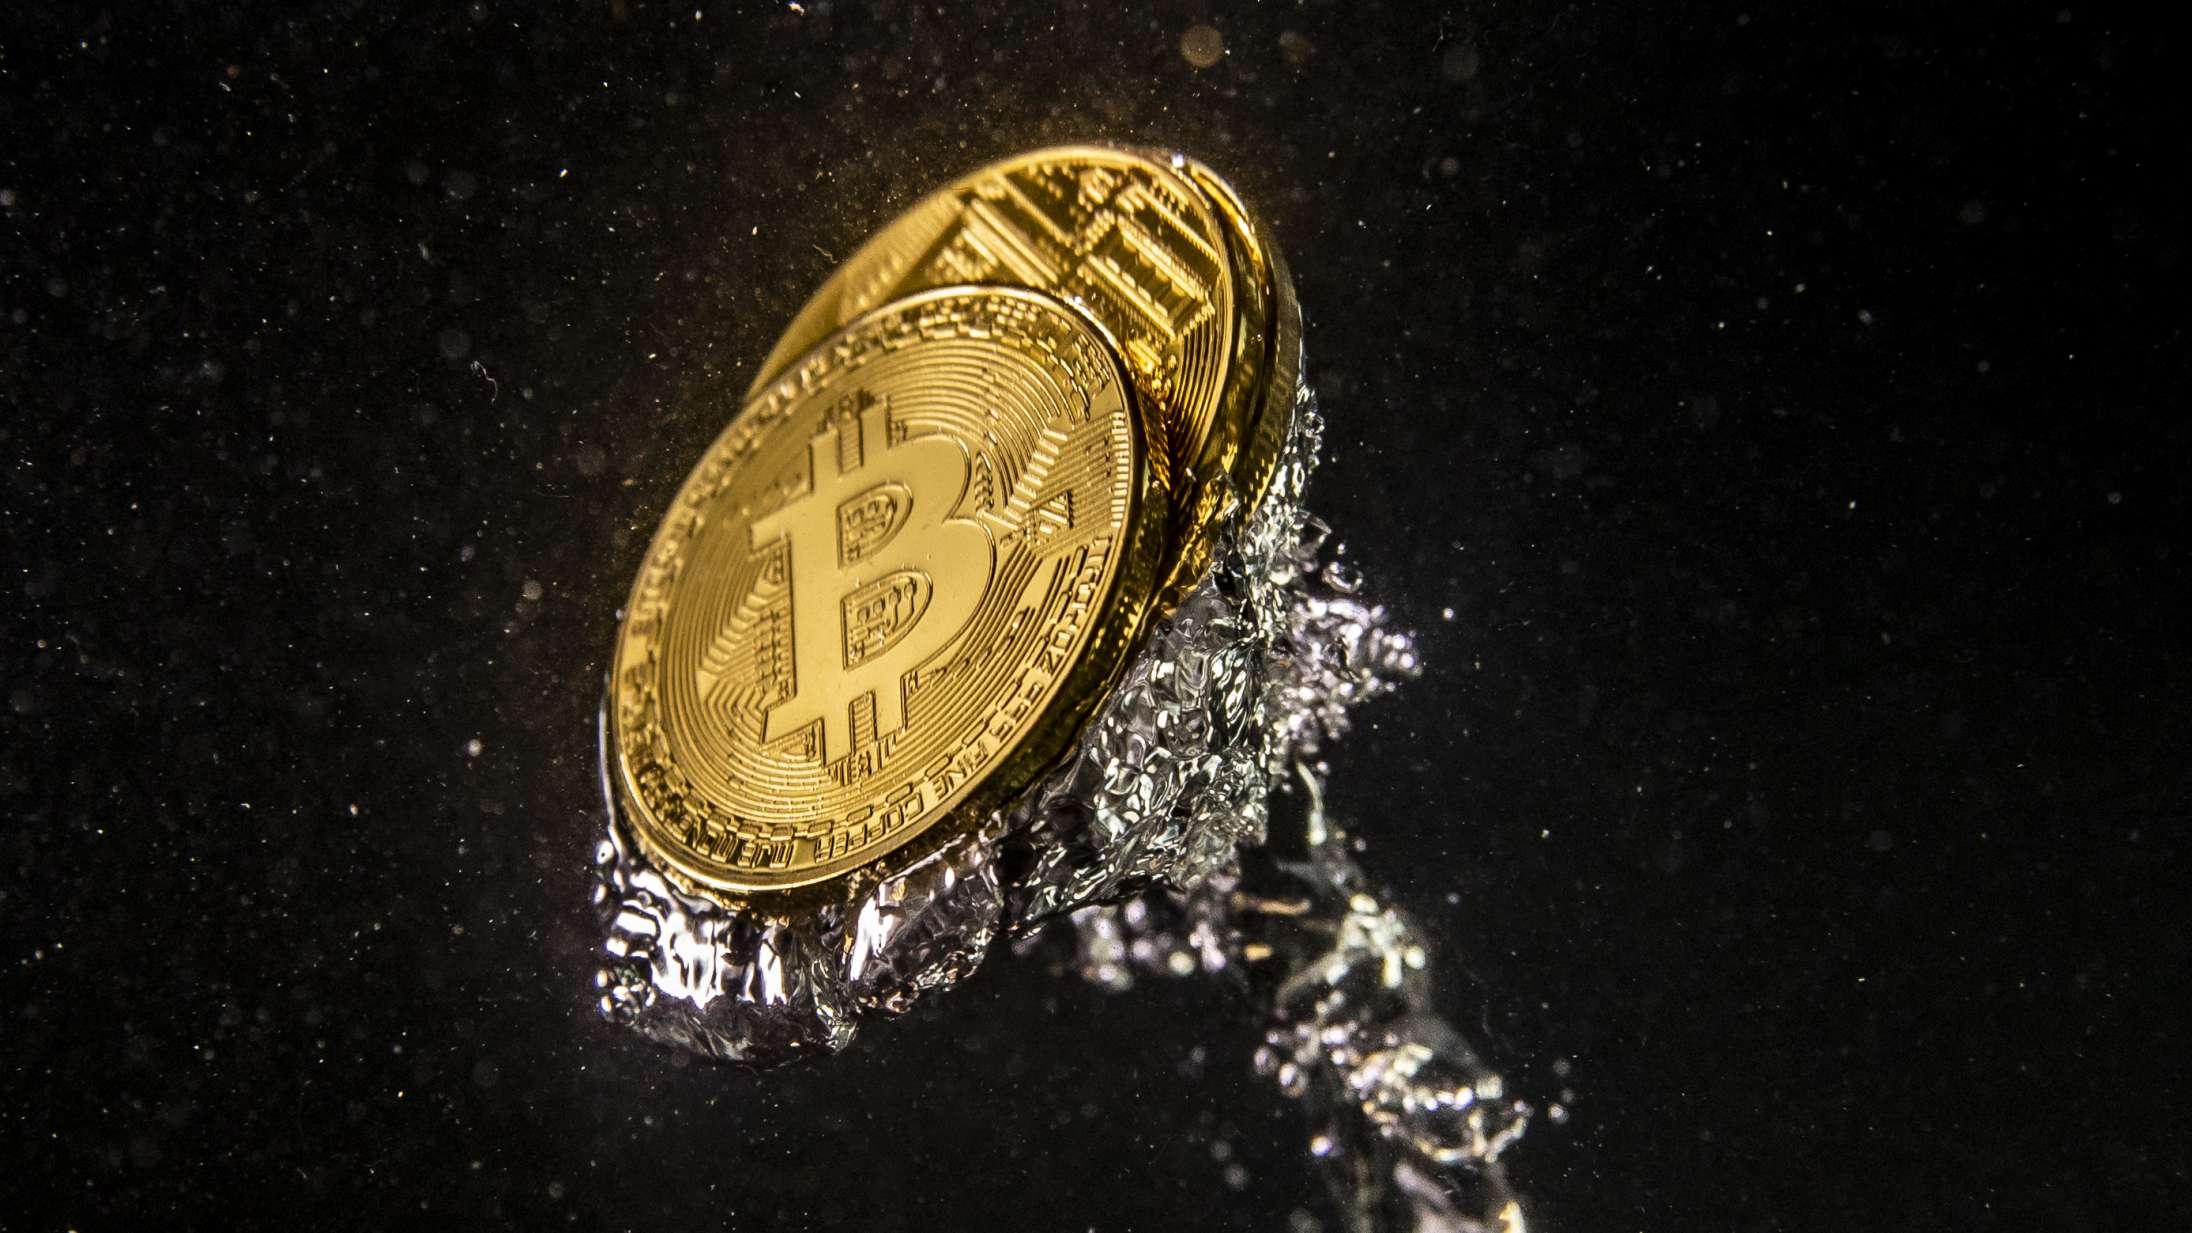 Kan du stadig nå at blive rig på Bitcoin?